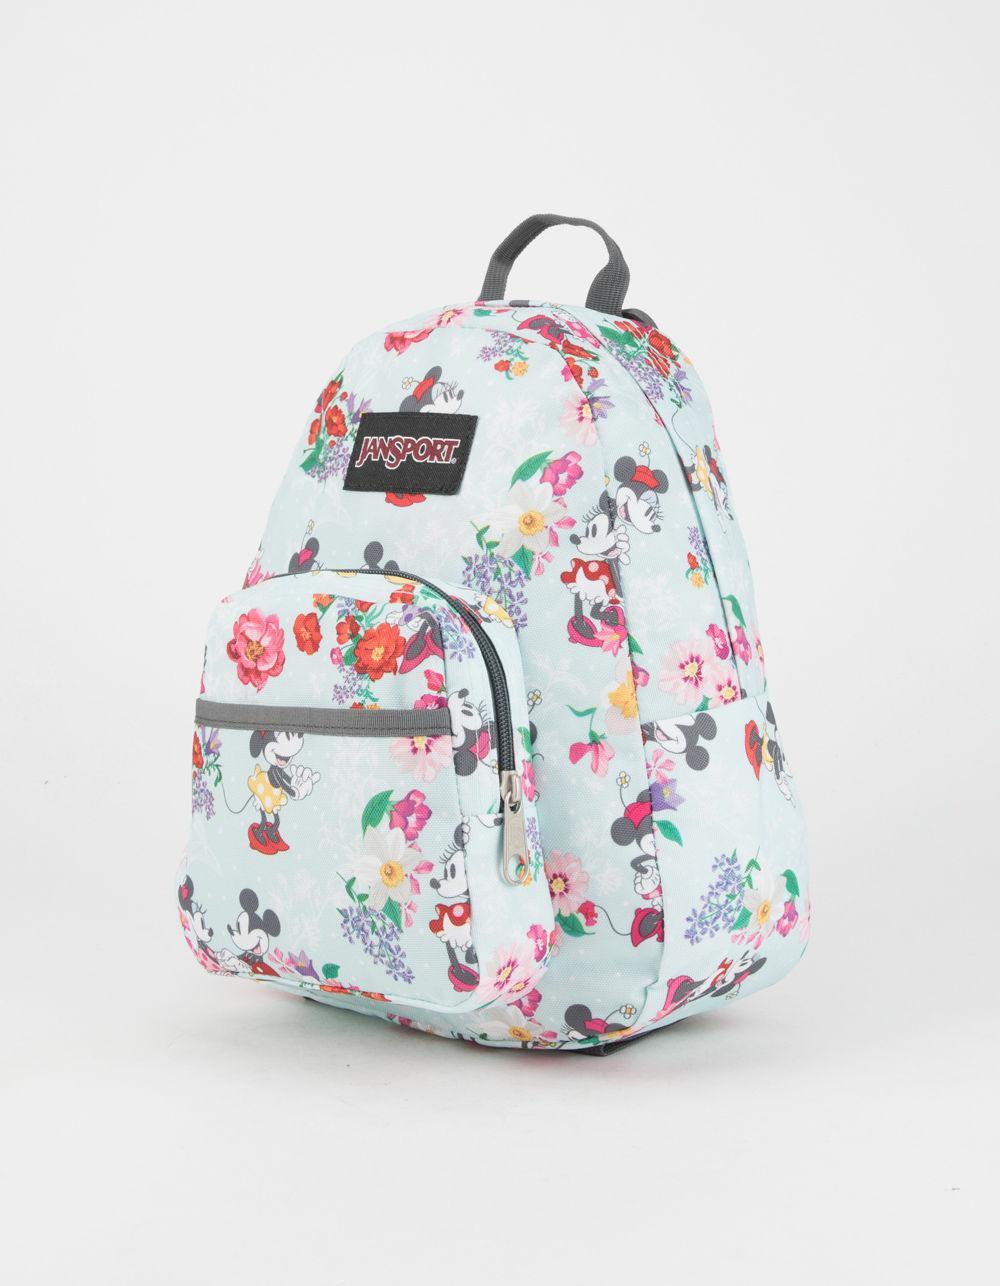 f4e027a463a Lyst - Jansport X Disney Half Pint Fx Mini Backpack